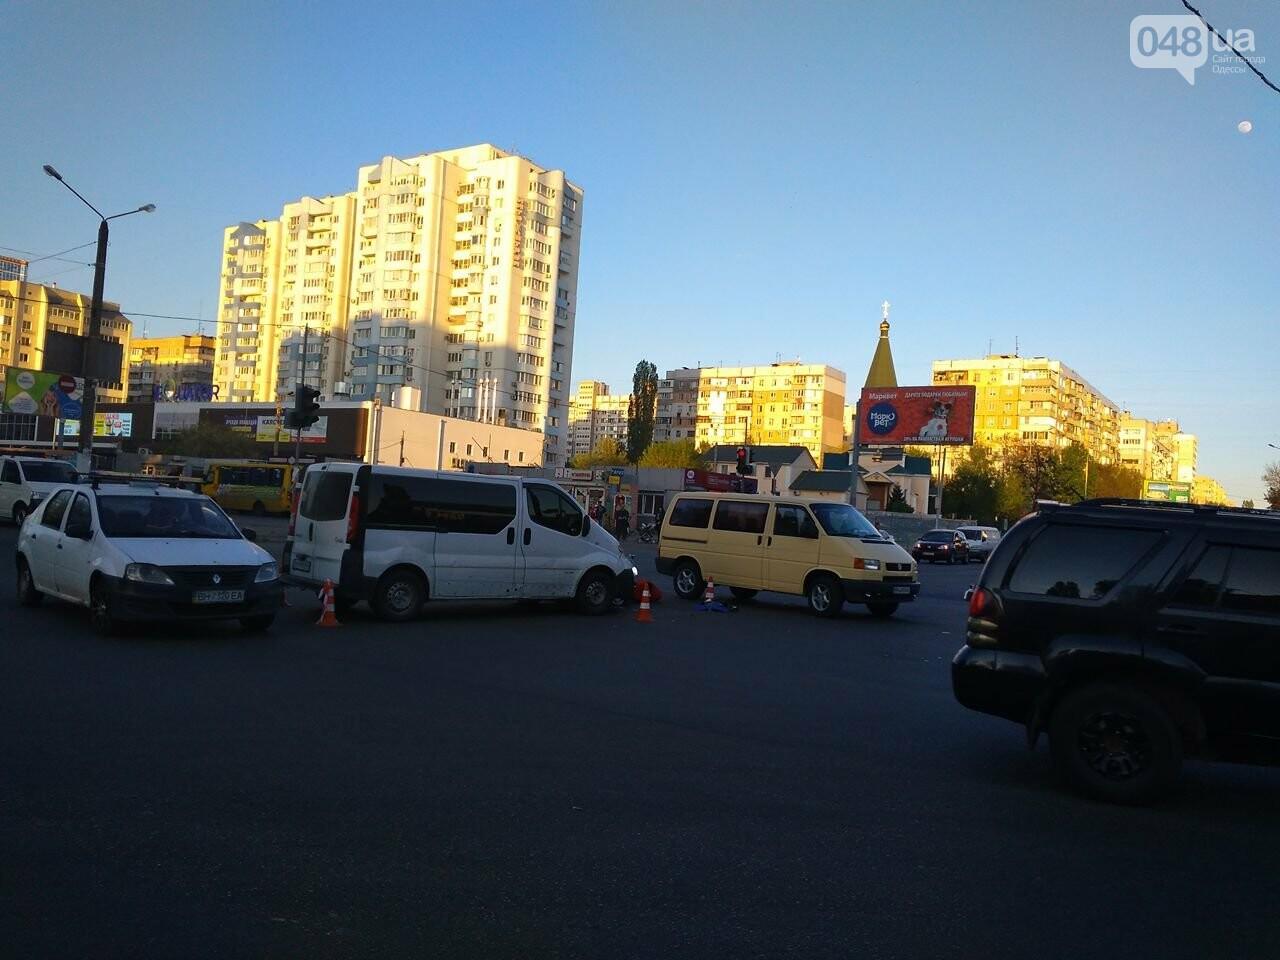 На Котовского одесский мопедист попал под колеса микроавтобуса (ФОТО), фото-5